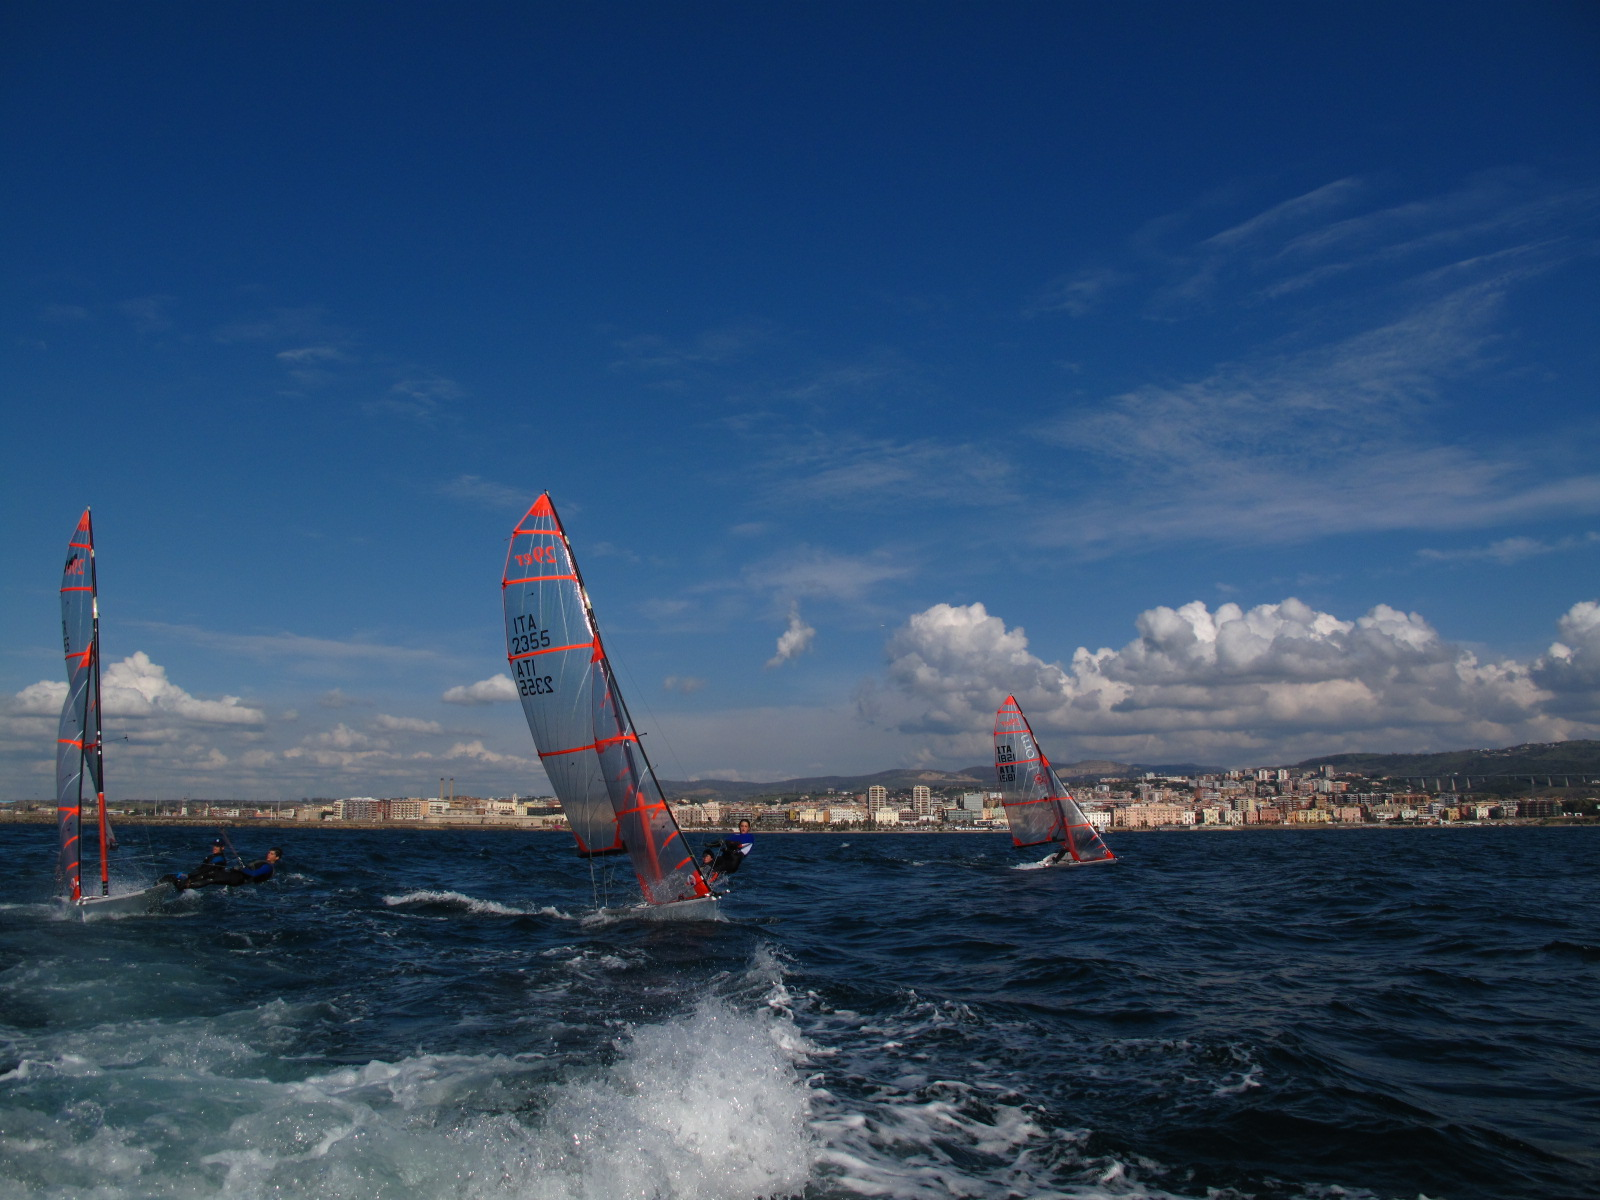 Freedom at sea...